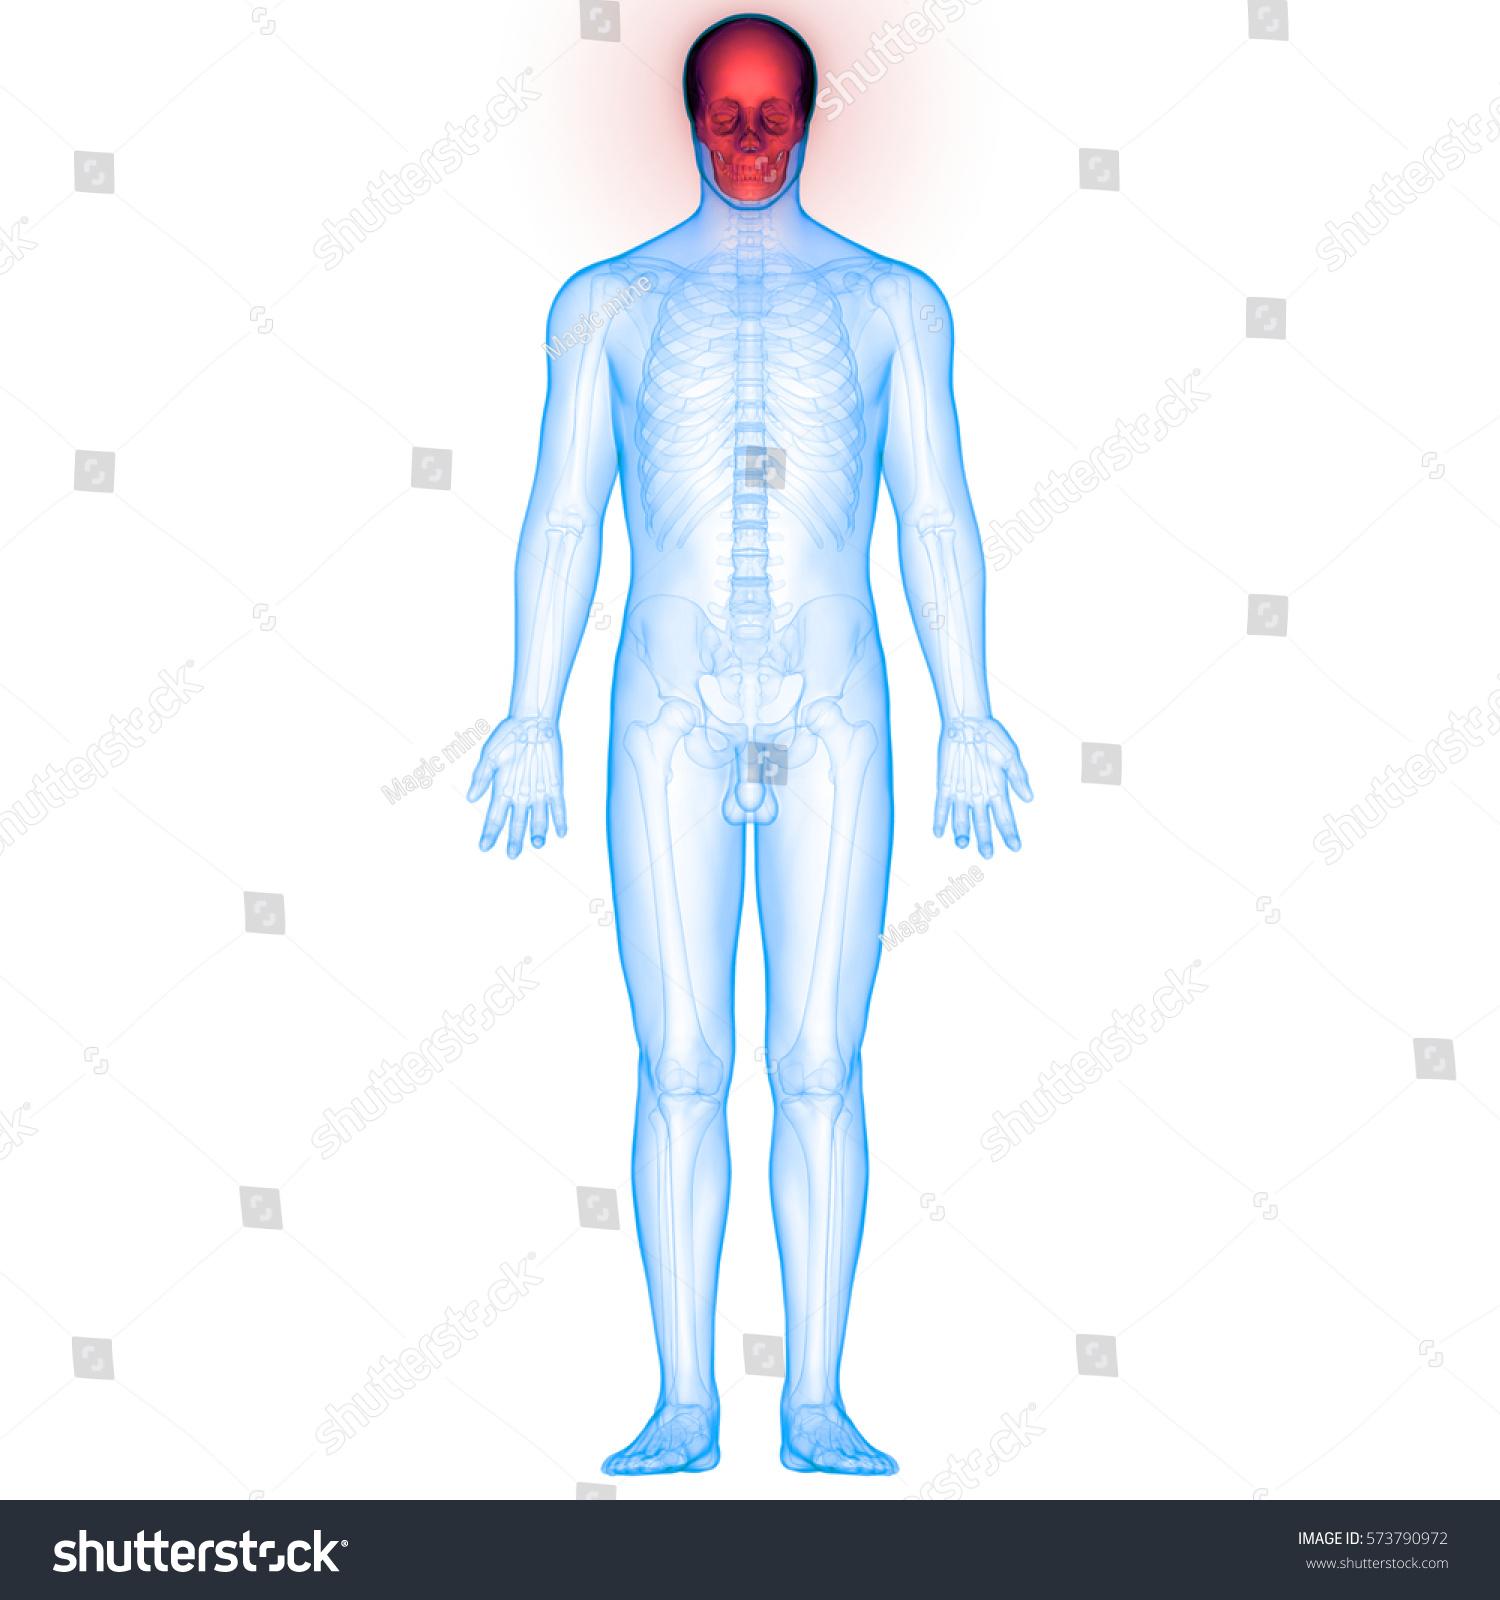 Human Body Bone Joint Pains Anatomy Stock Illustration 573790972 ...